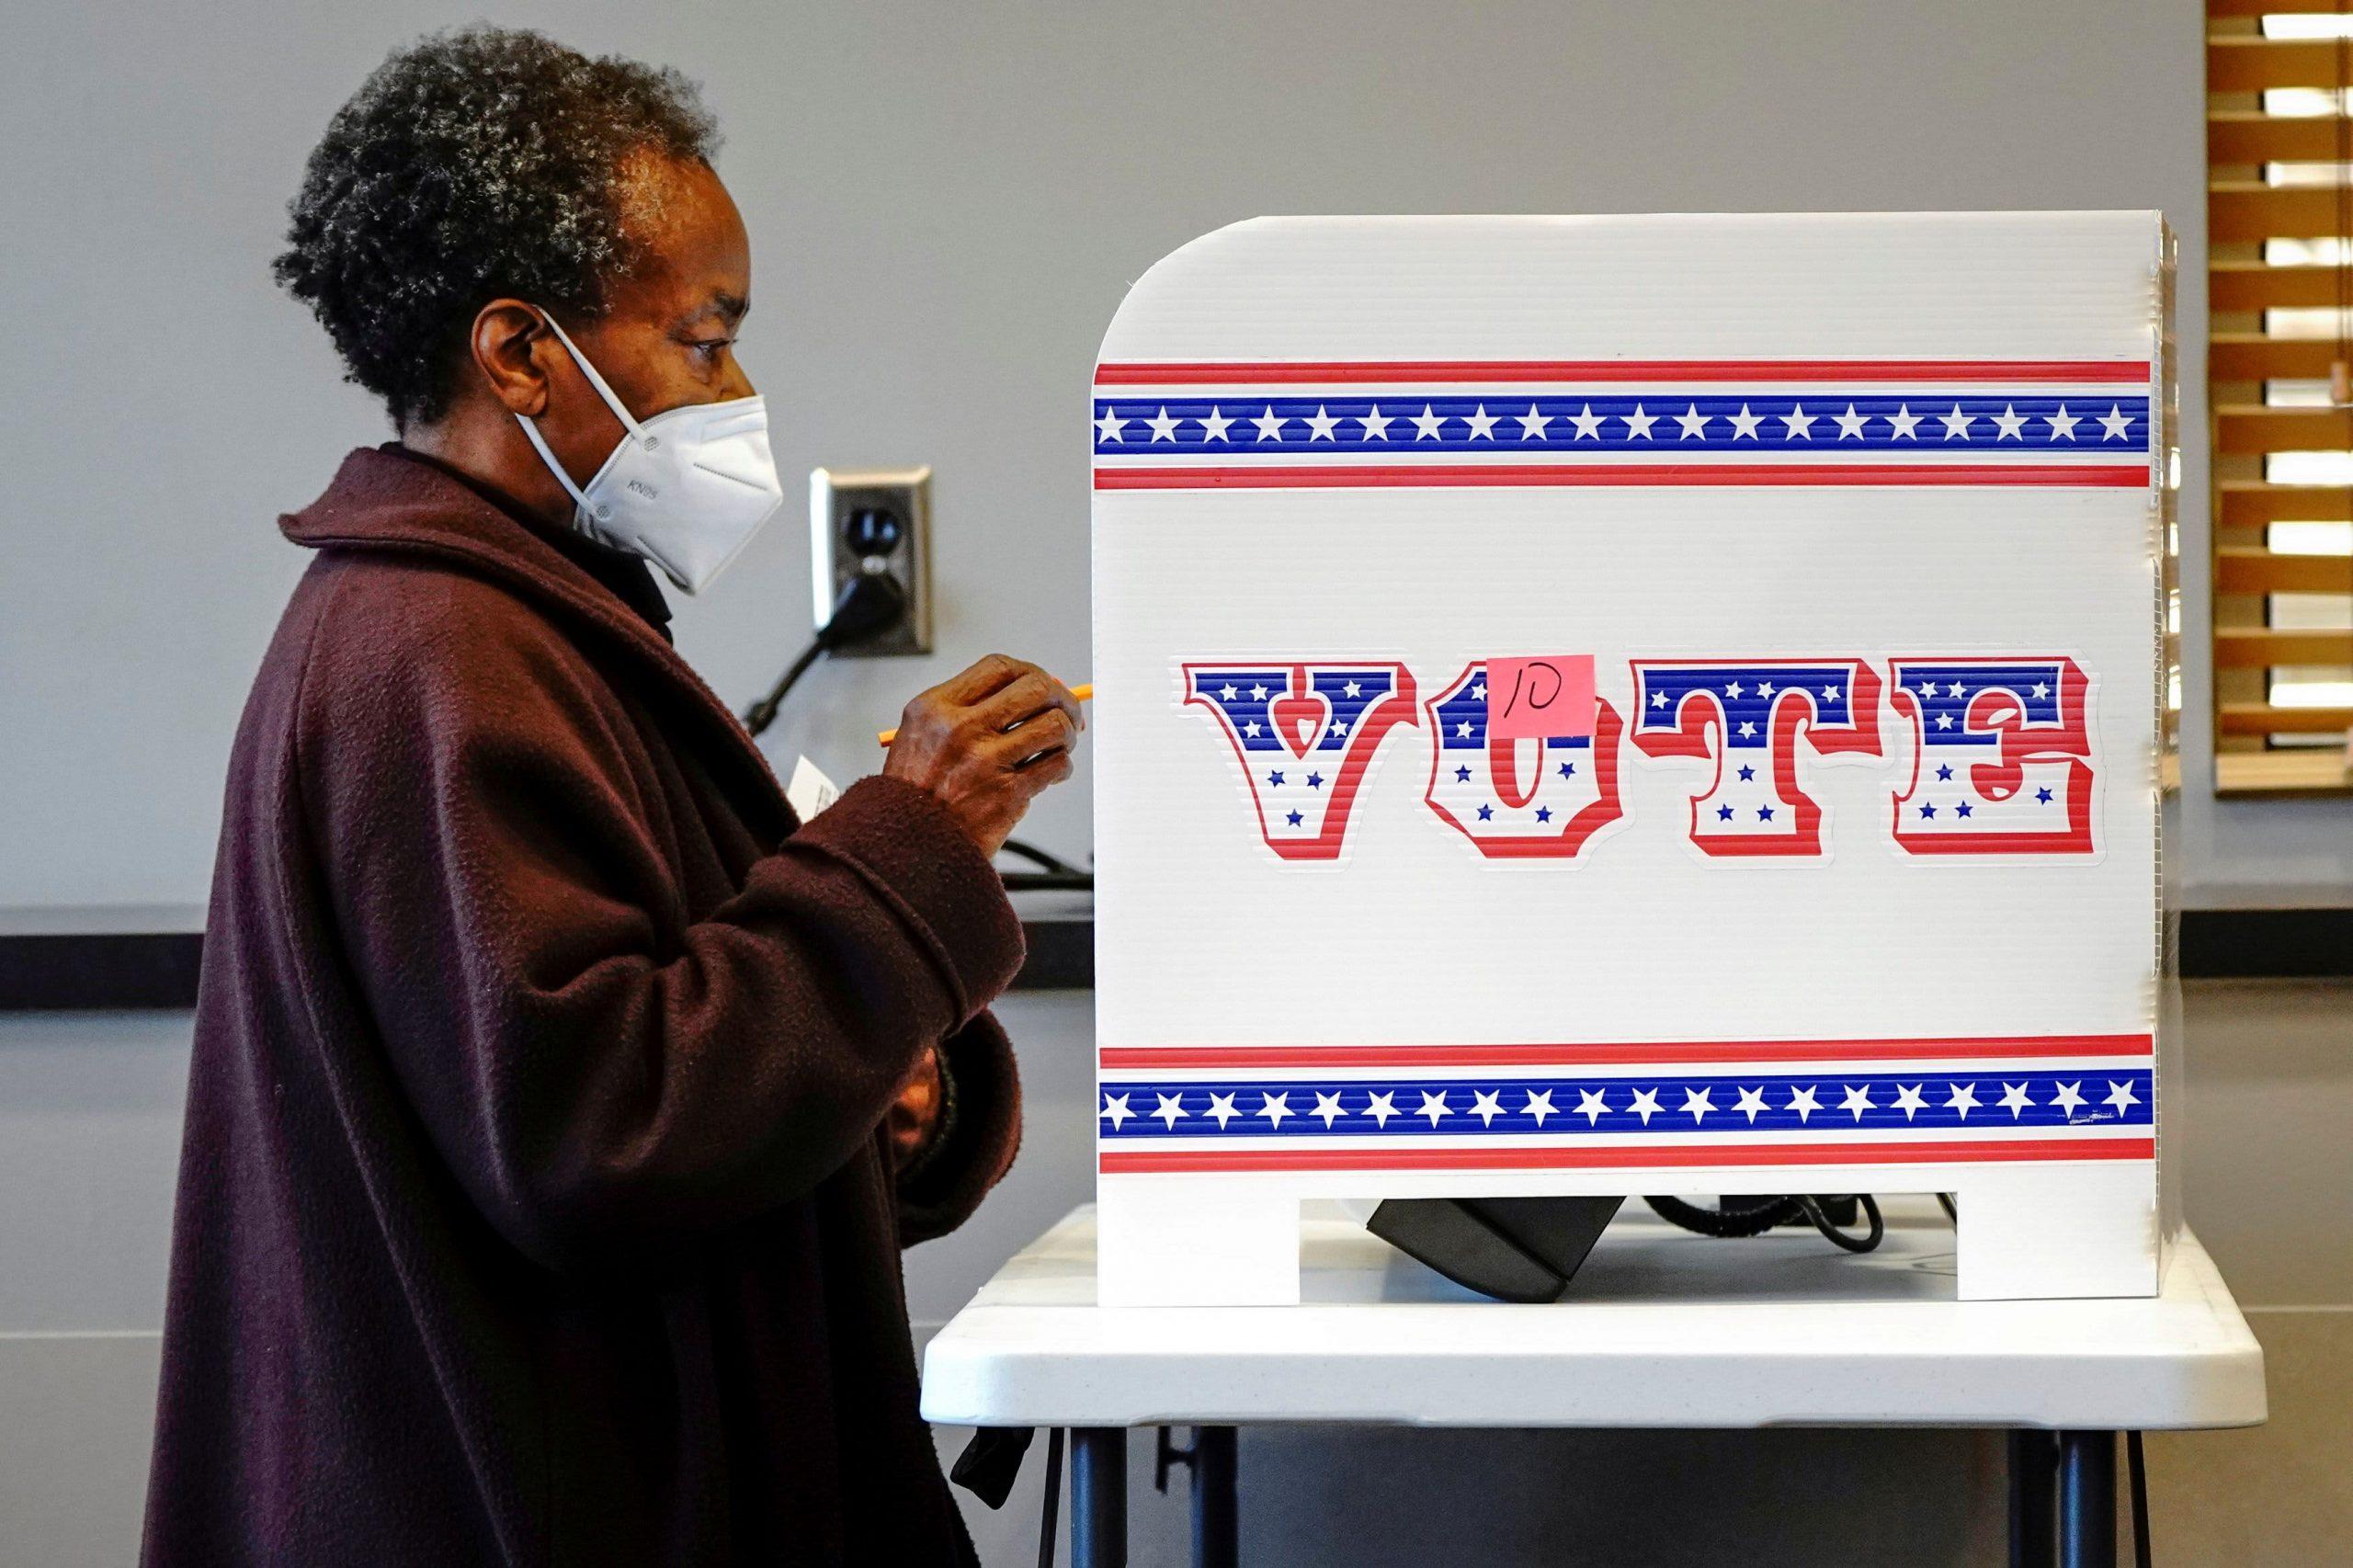 Isu 14 Ribu Orang yang Sudah Meninggal Mempunyai Hak Suara di Michigan Saat Pemilu Amerika Serikat? Begini Faktanya